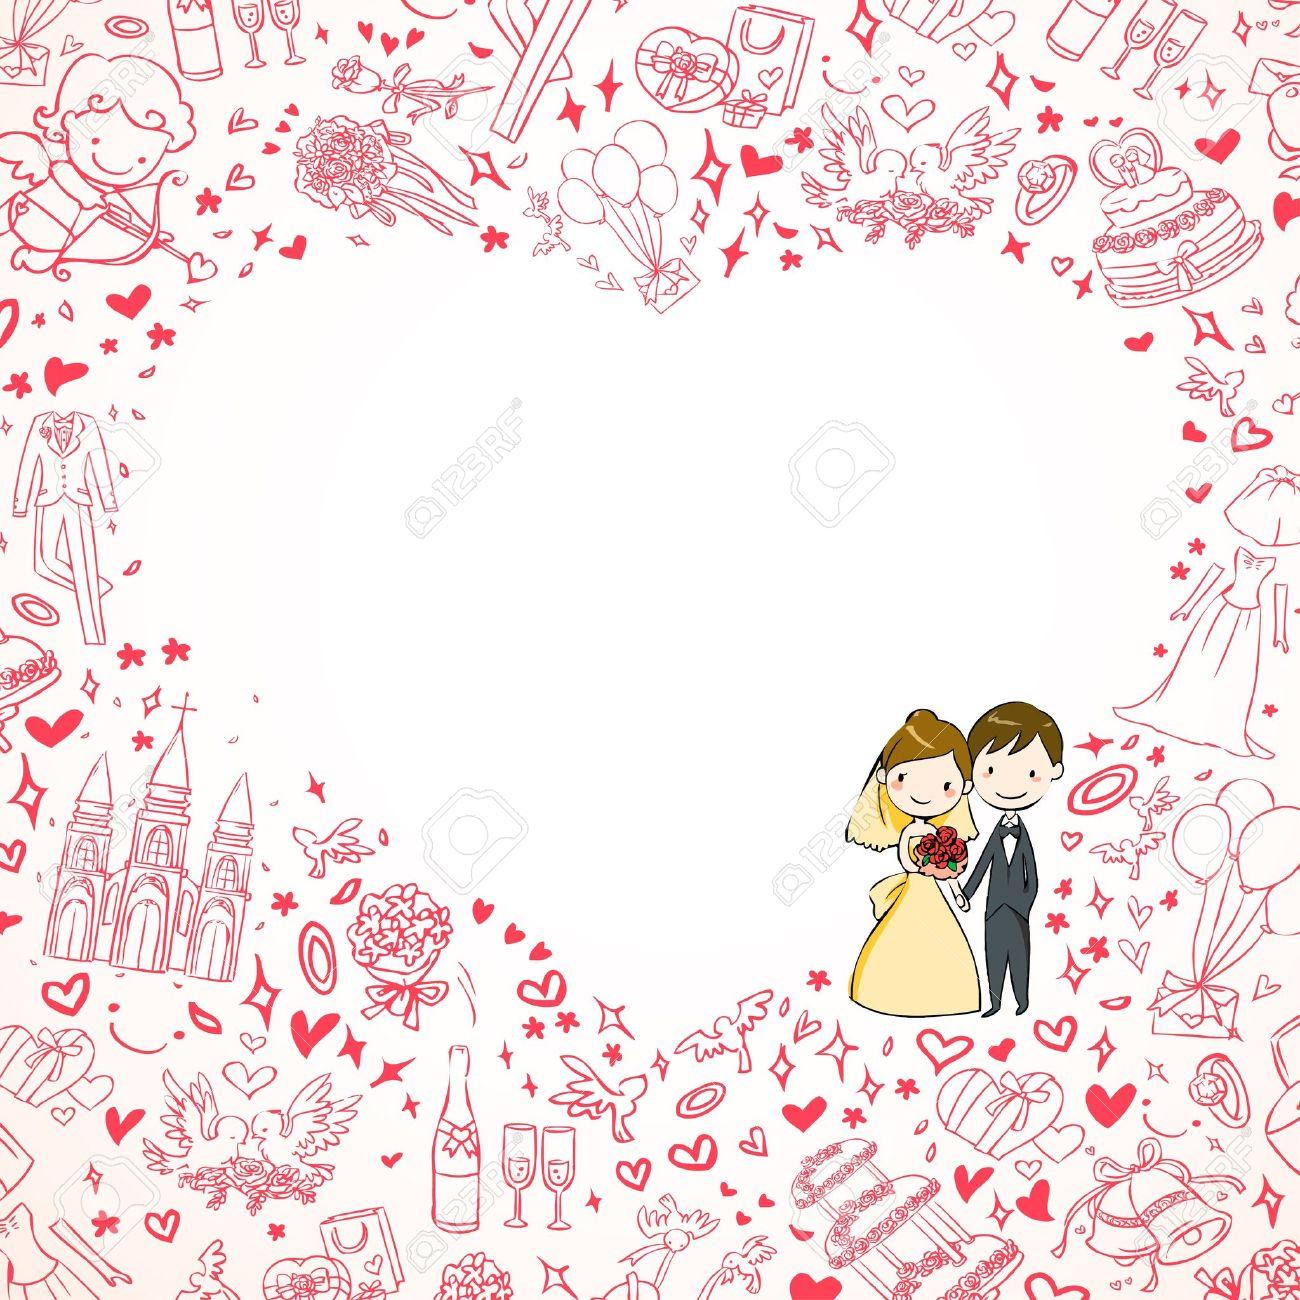 Wedding Invitation Background Free Vector Download (42,449 Free ...